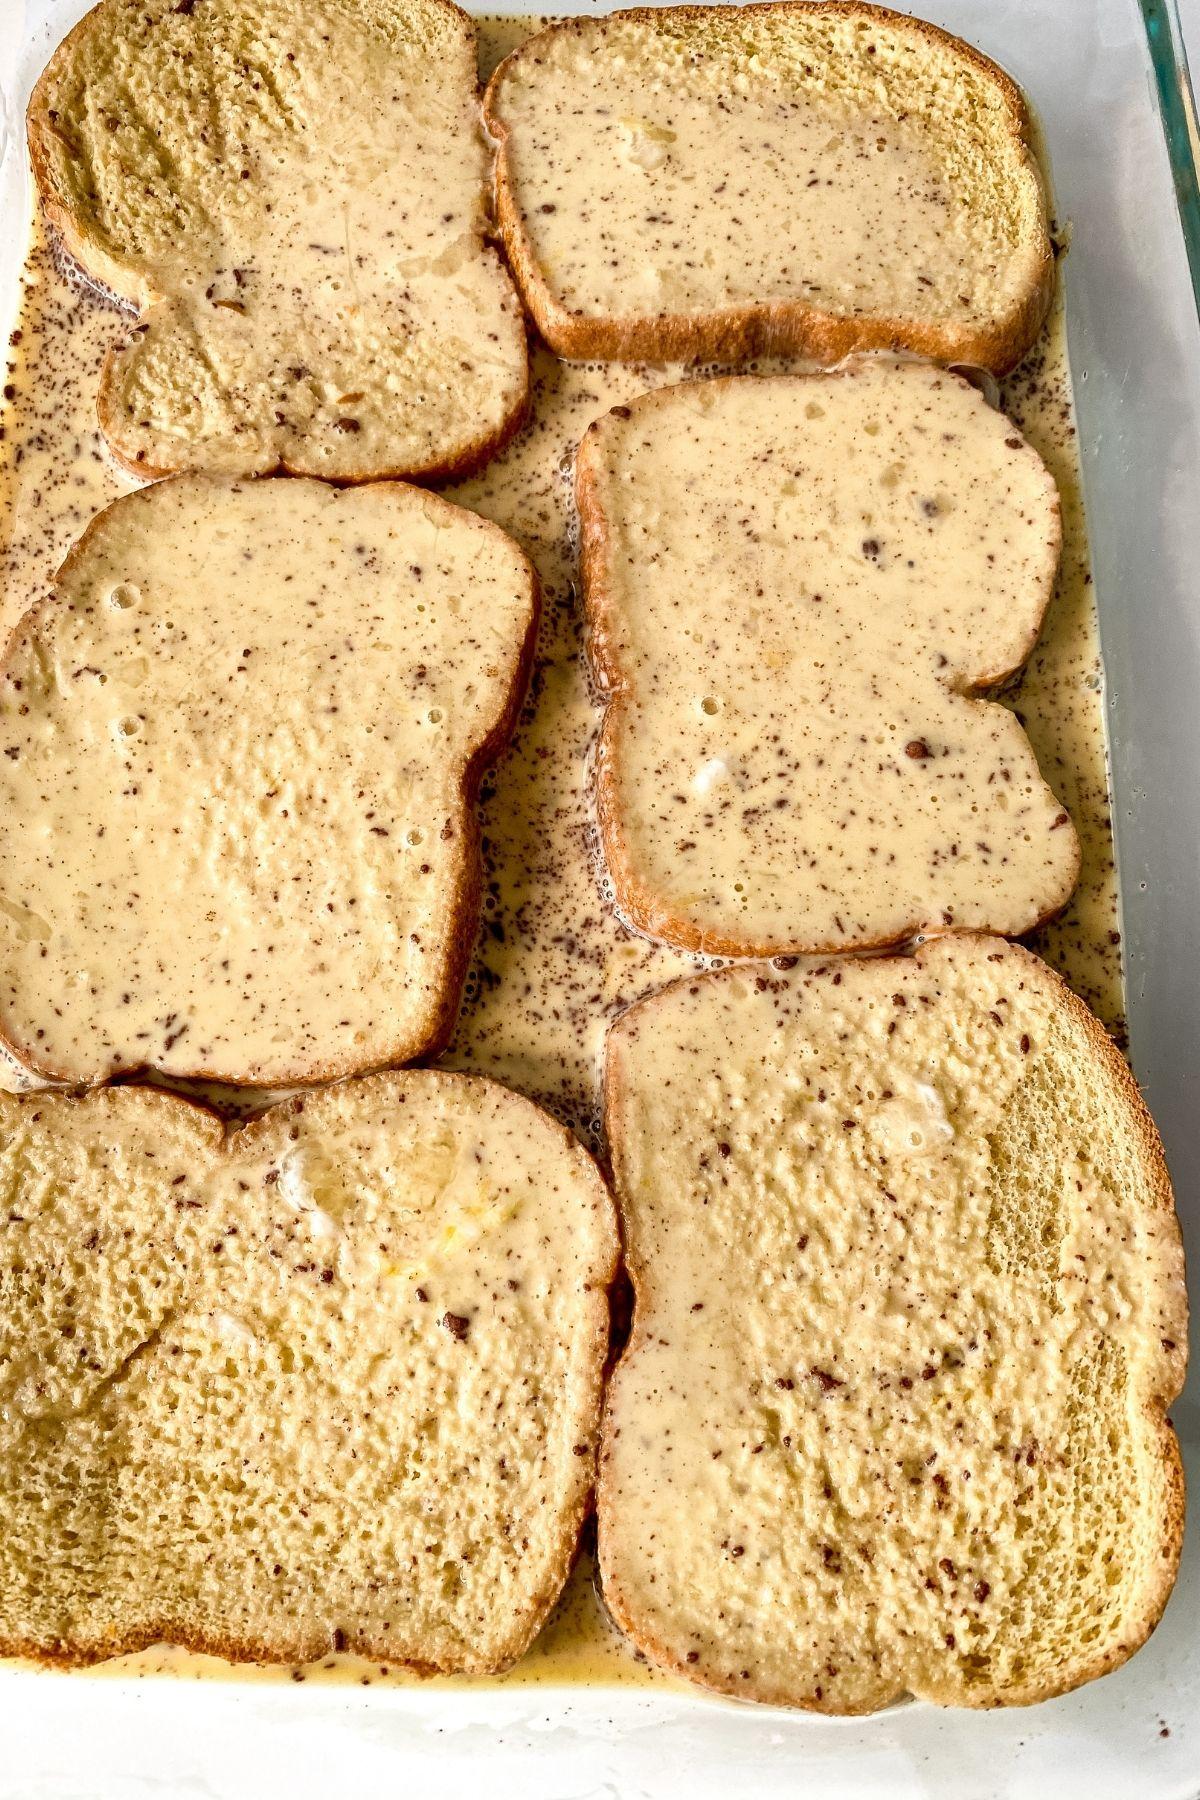 French toast soaking